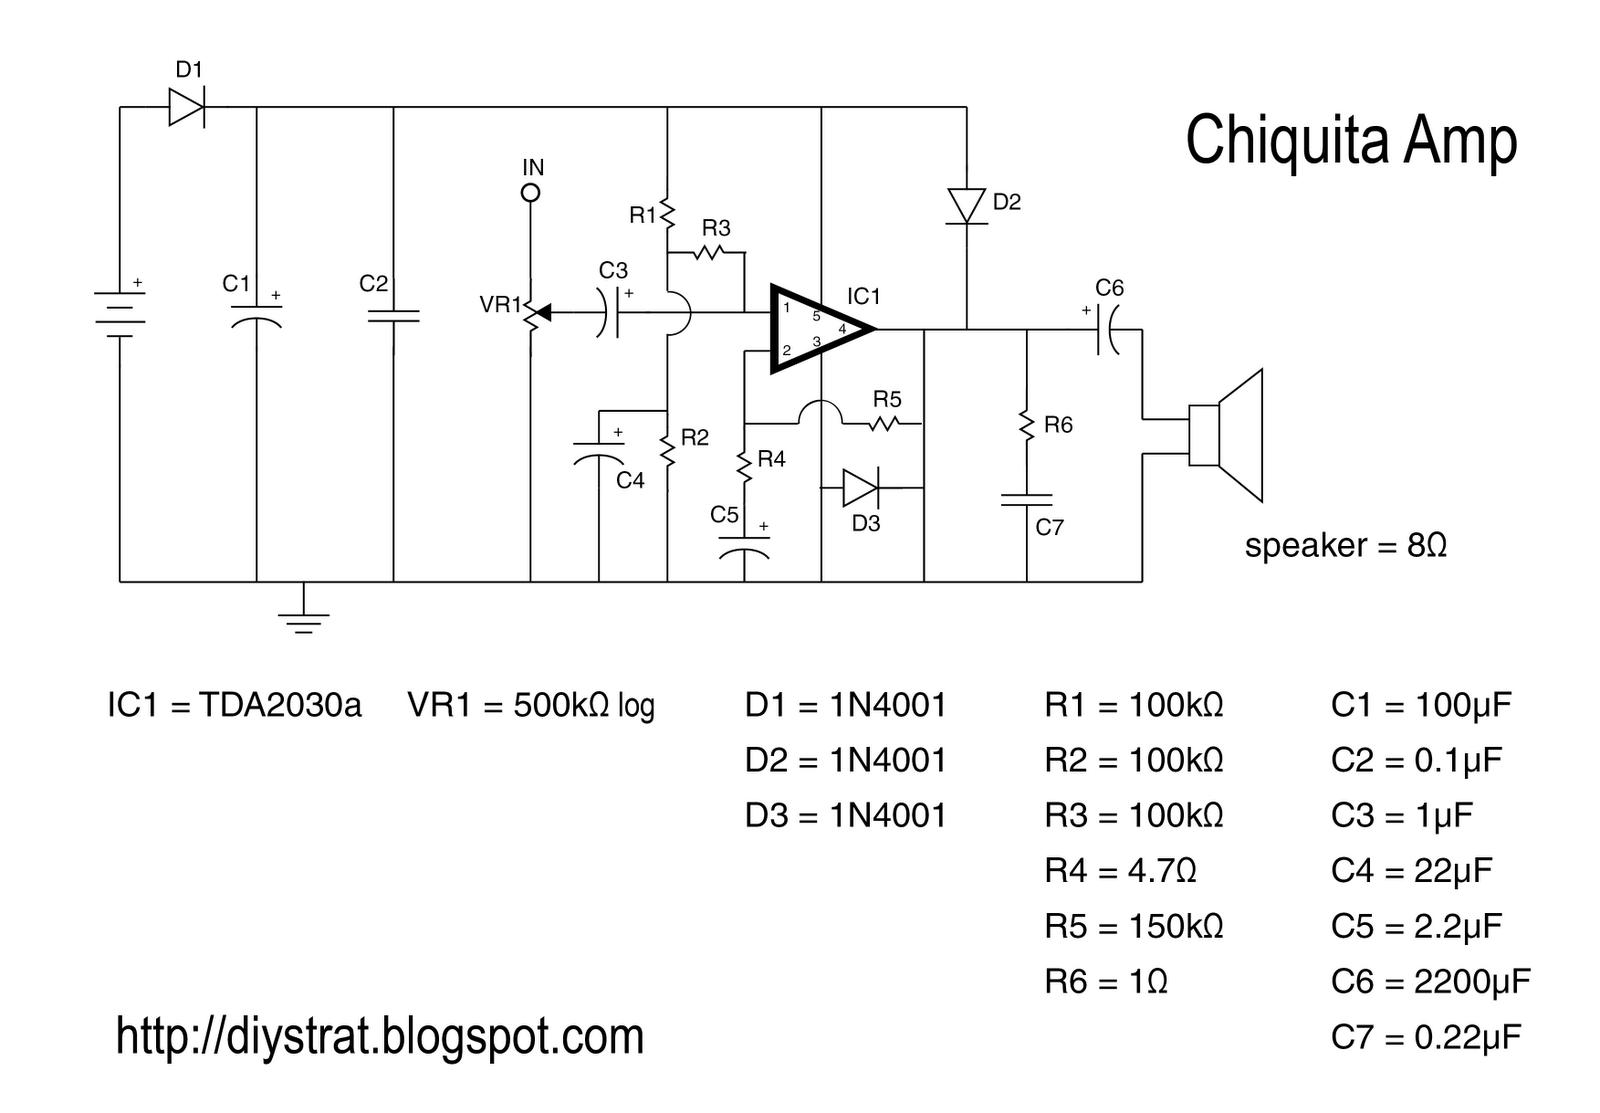 guitar wiring schematics b guitar wiring schematics diagram dean b guitar wiring schematics diagram simple circuit [ 1600 x 1113 Pixel ]